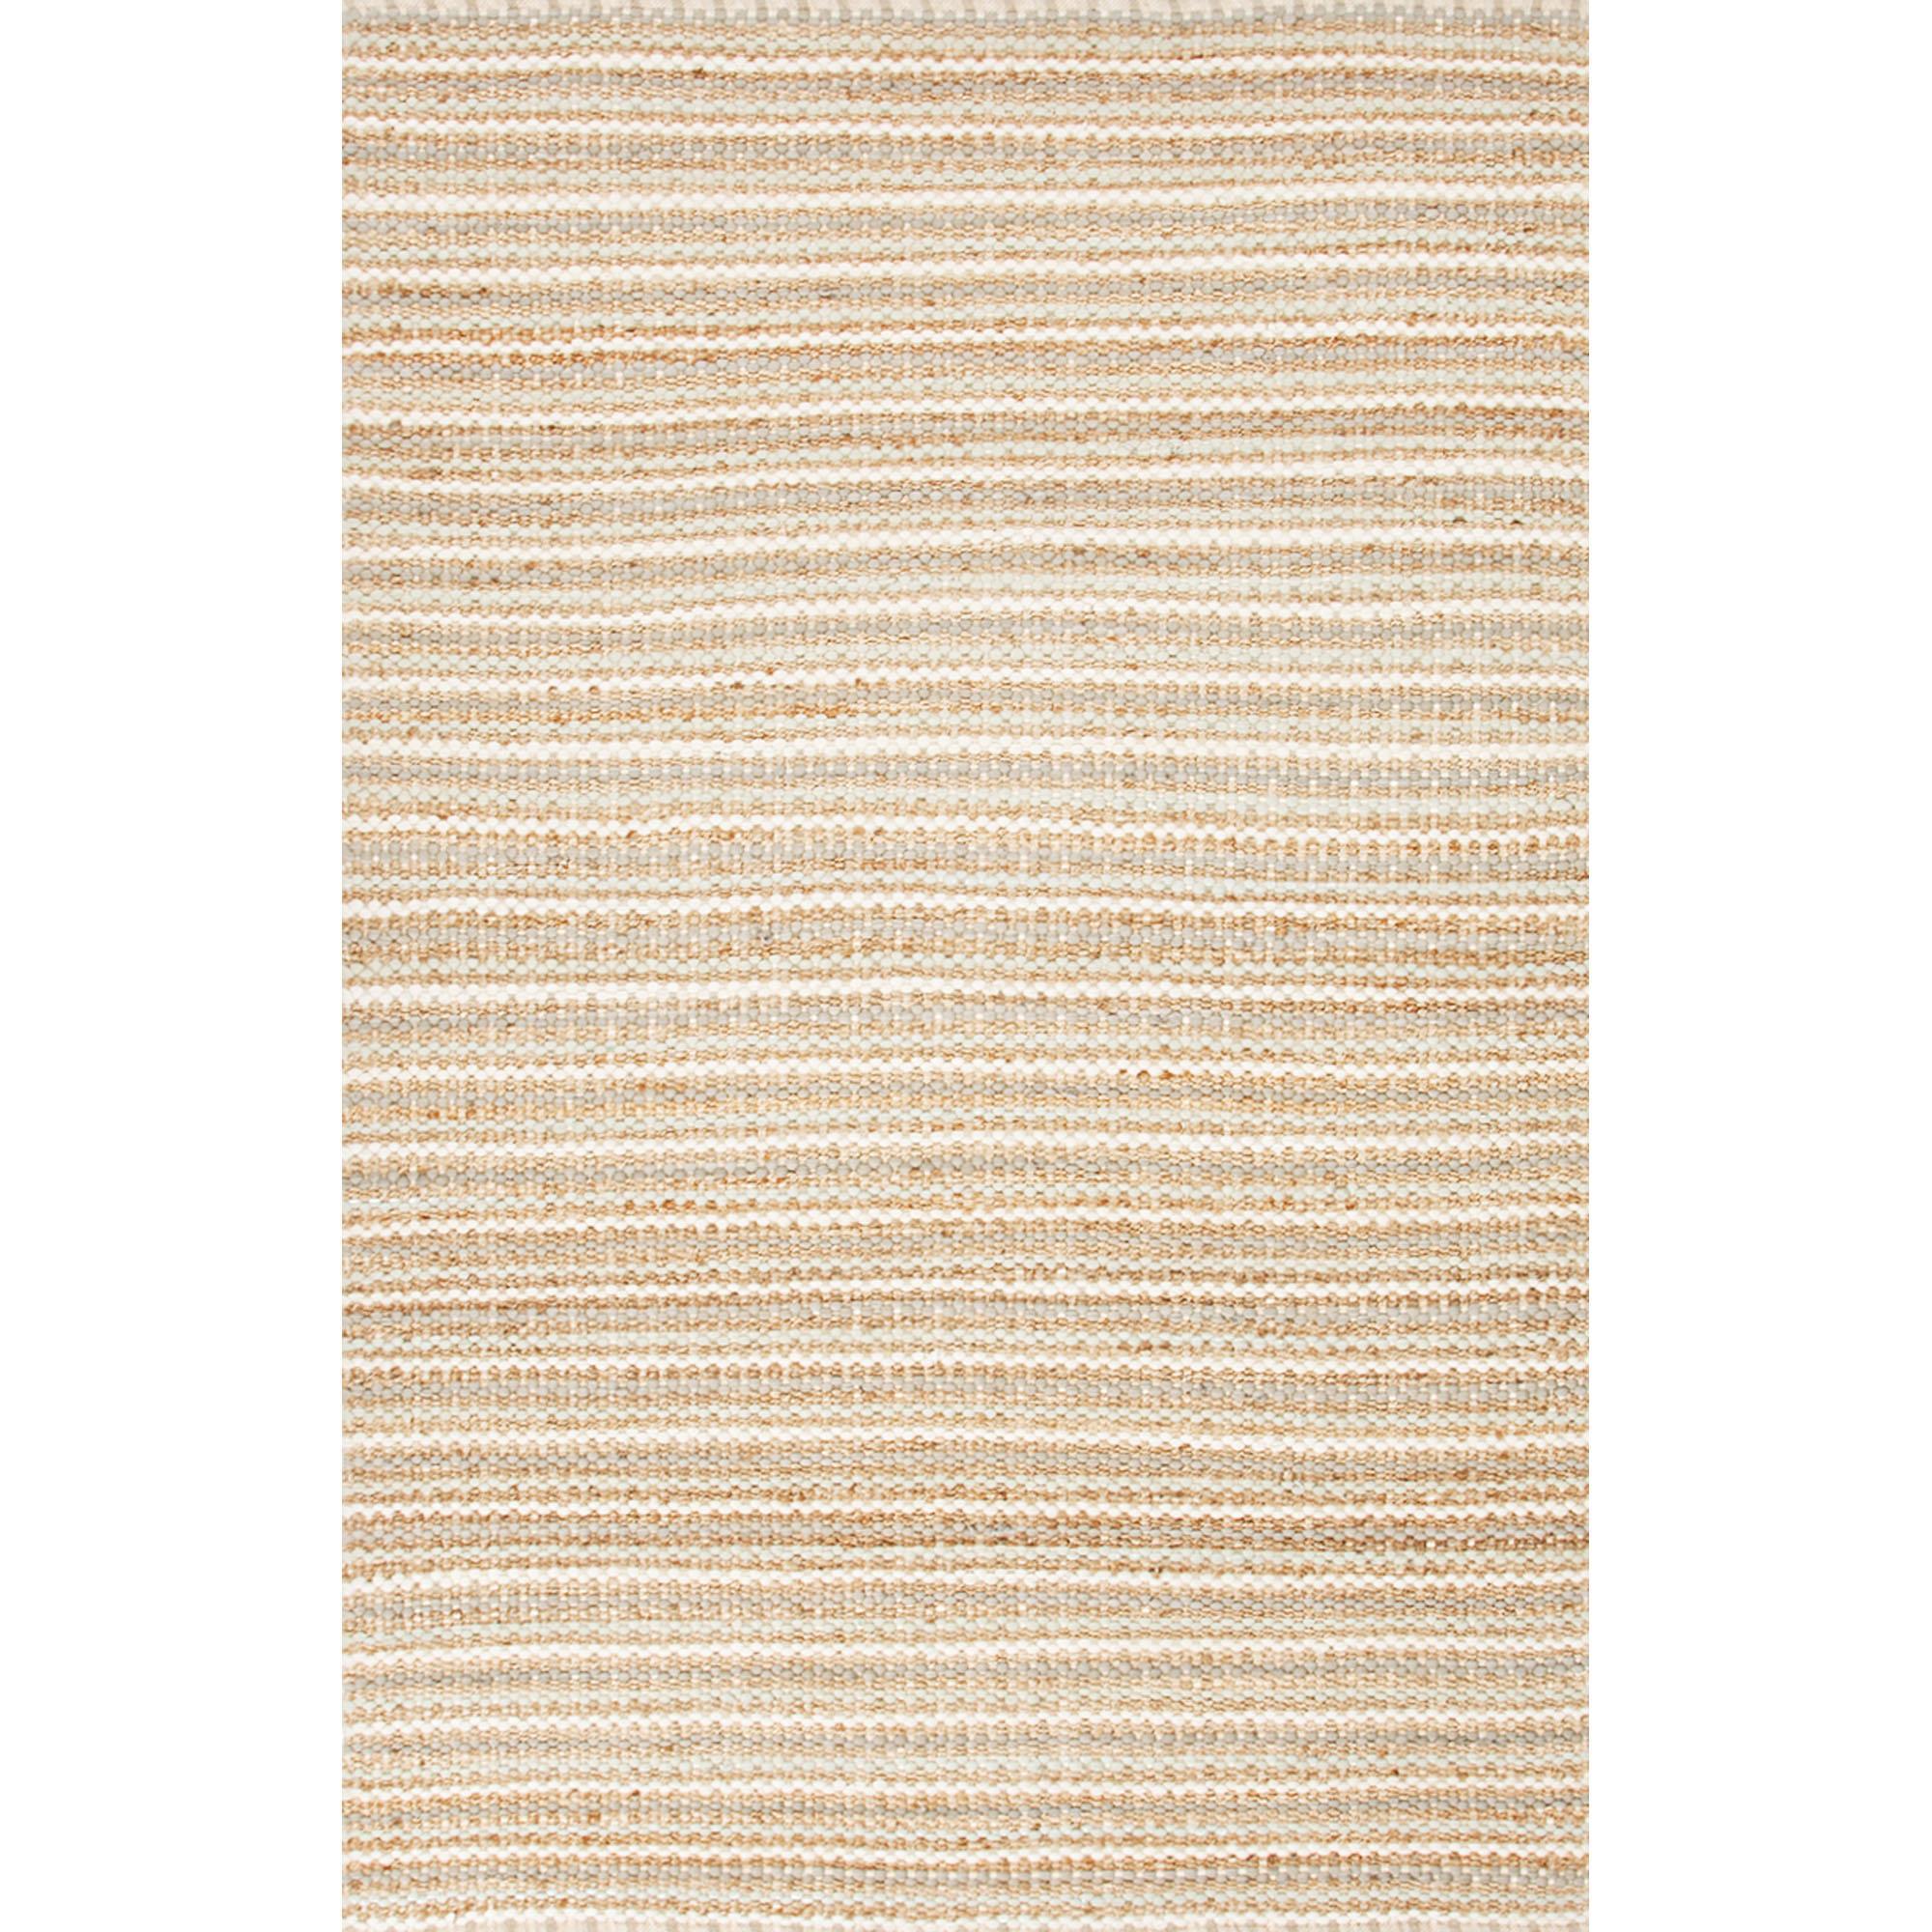 Andes 5 x 8 Rug by JAIPUR Rugs at Sprintz Furniture